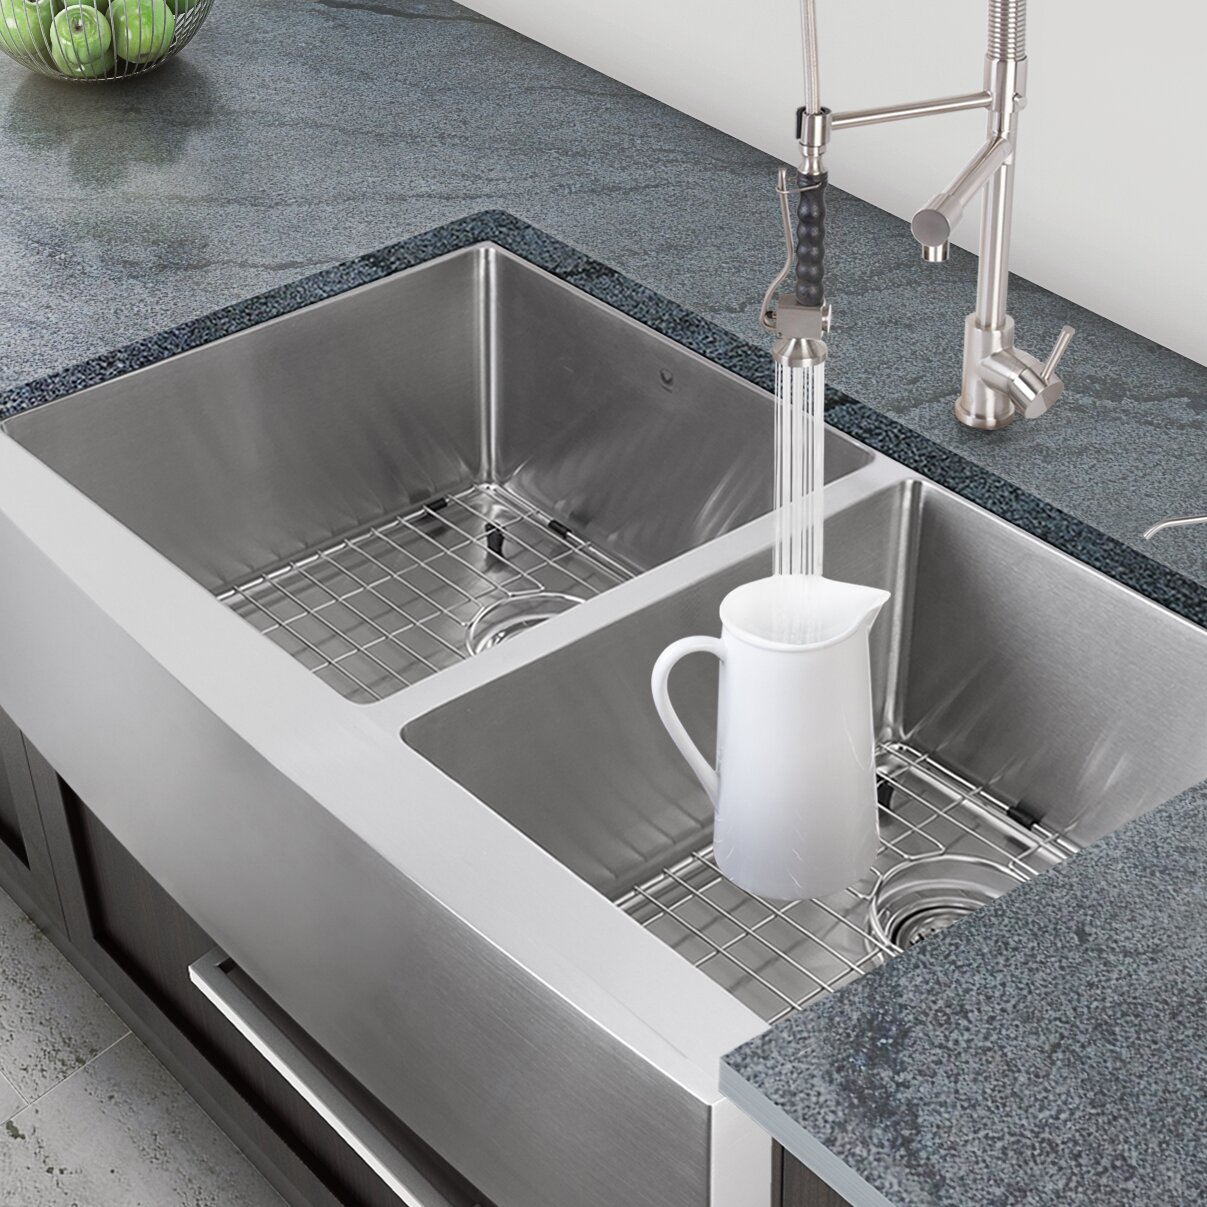 ... Double Bowl 16 Gauge Stainless Steel Kitchen Sink & Reviews Wayfair